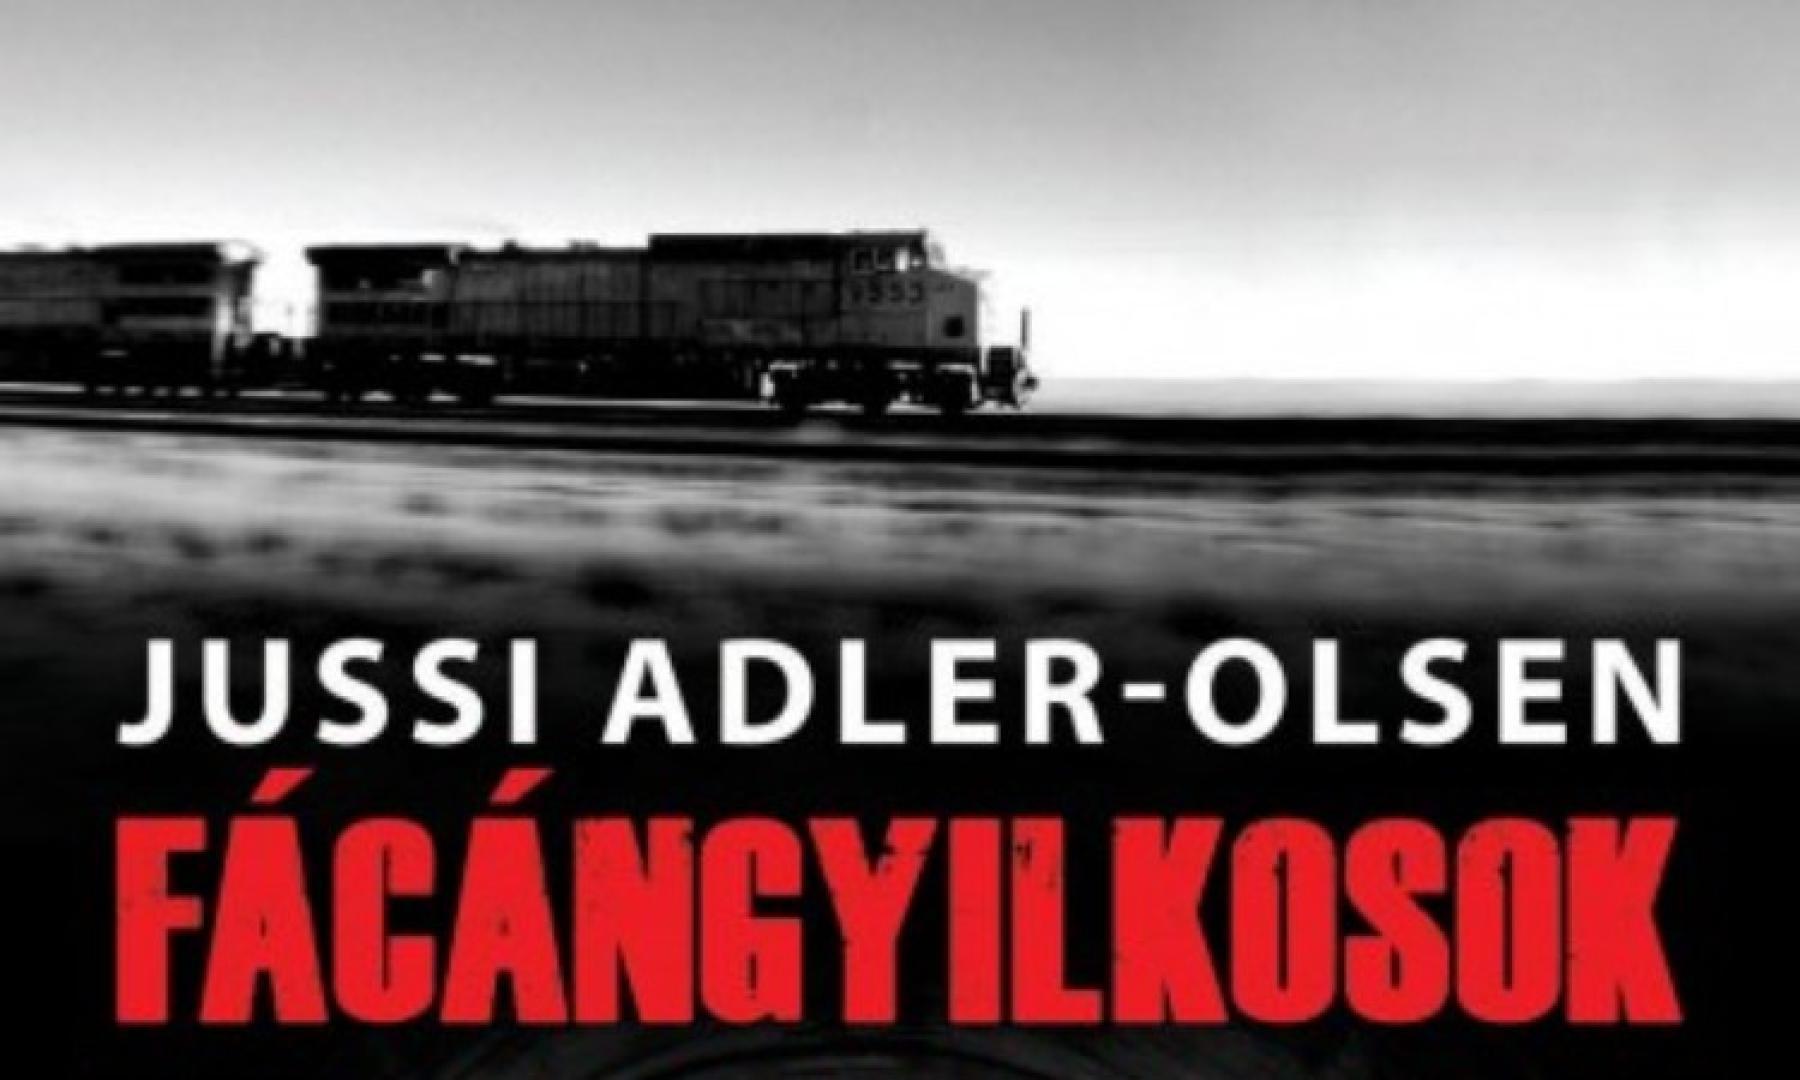 Jussi Adler-Olsen: Fácángyilkosok (2008)